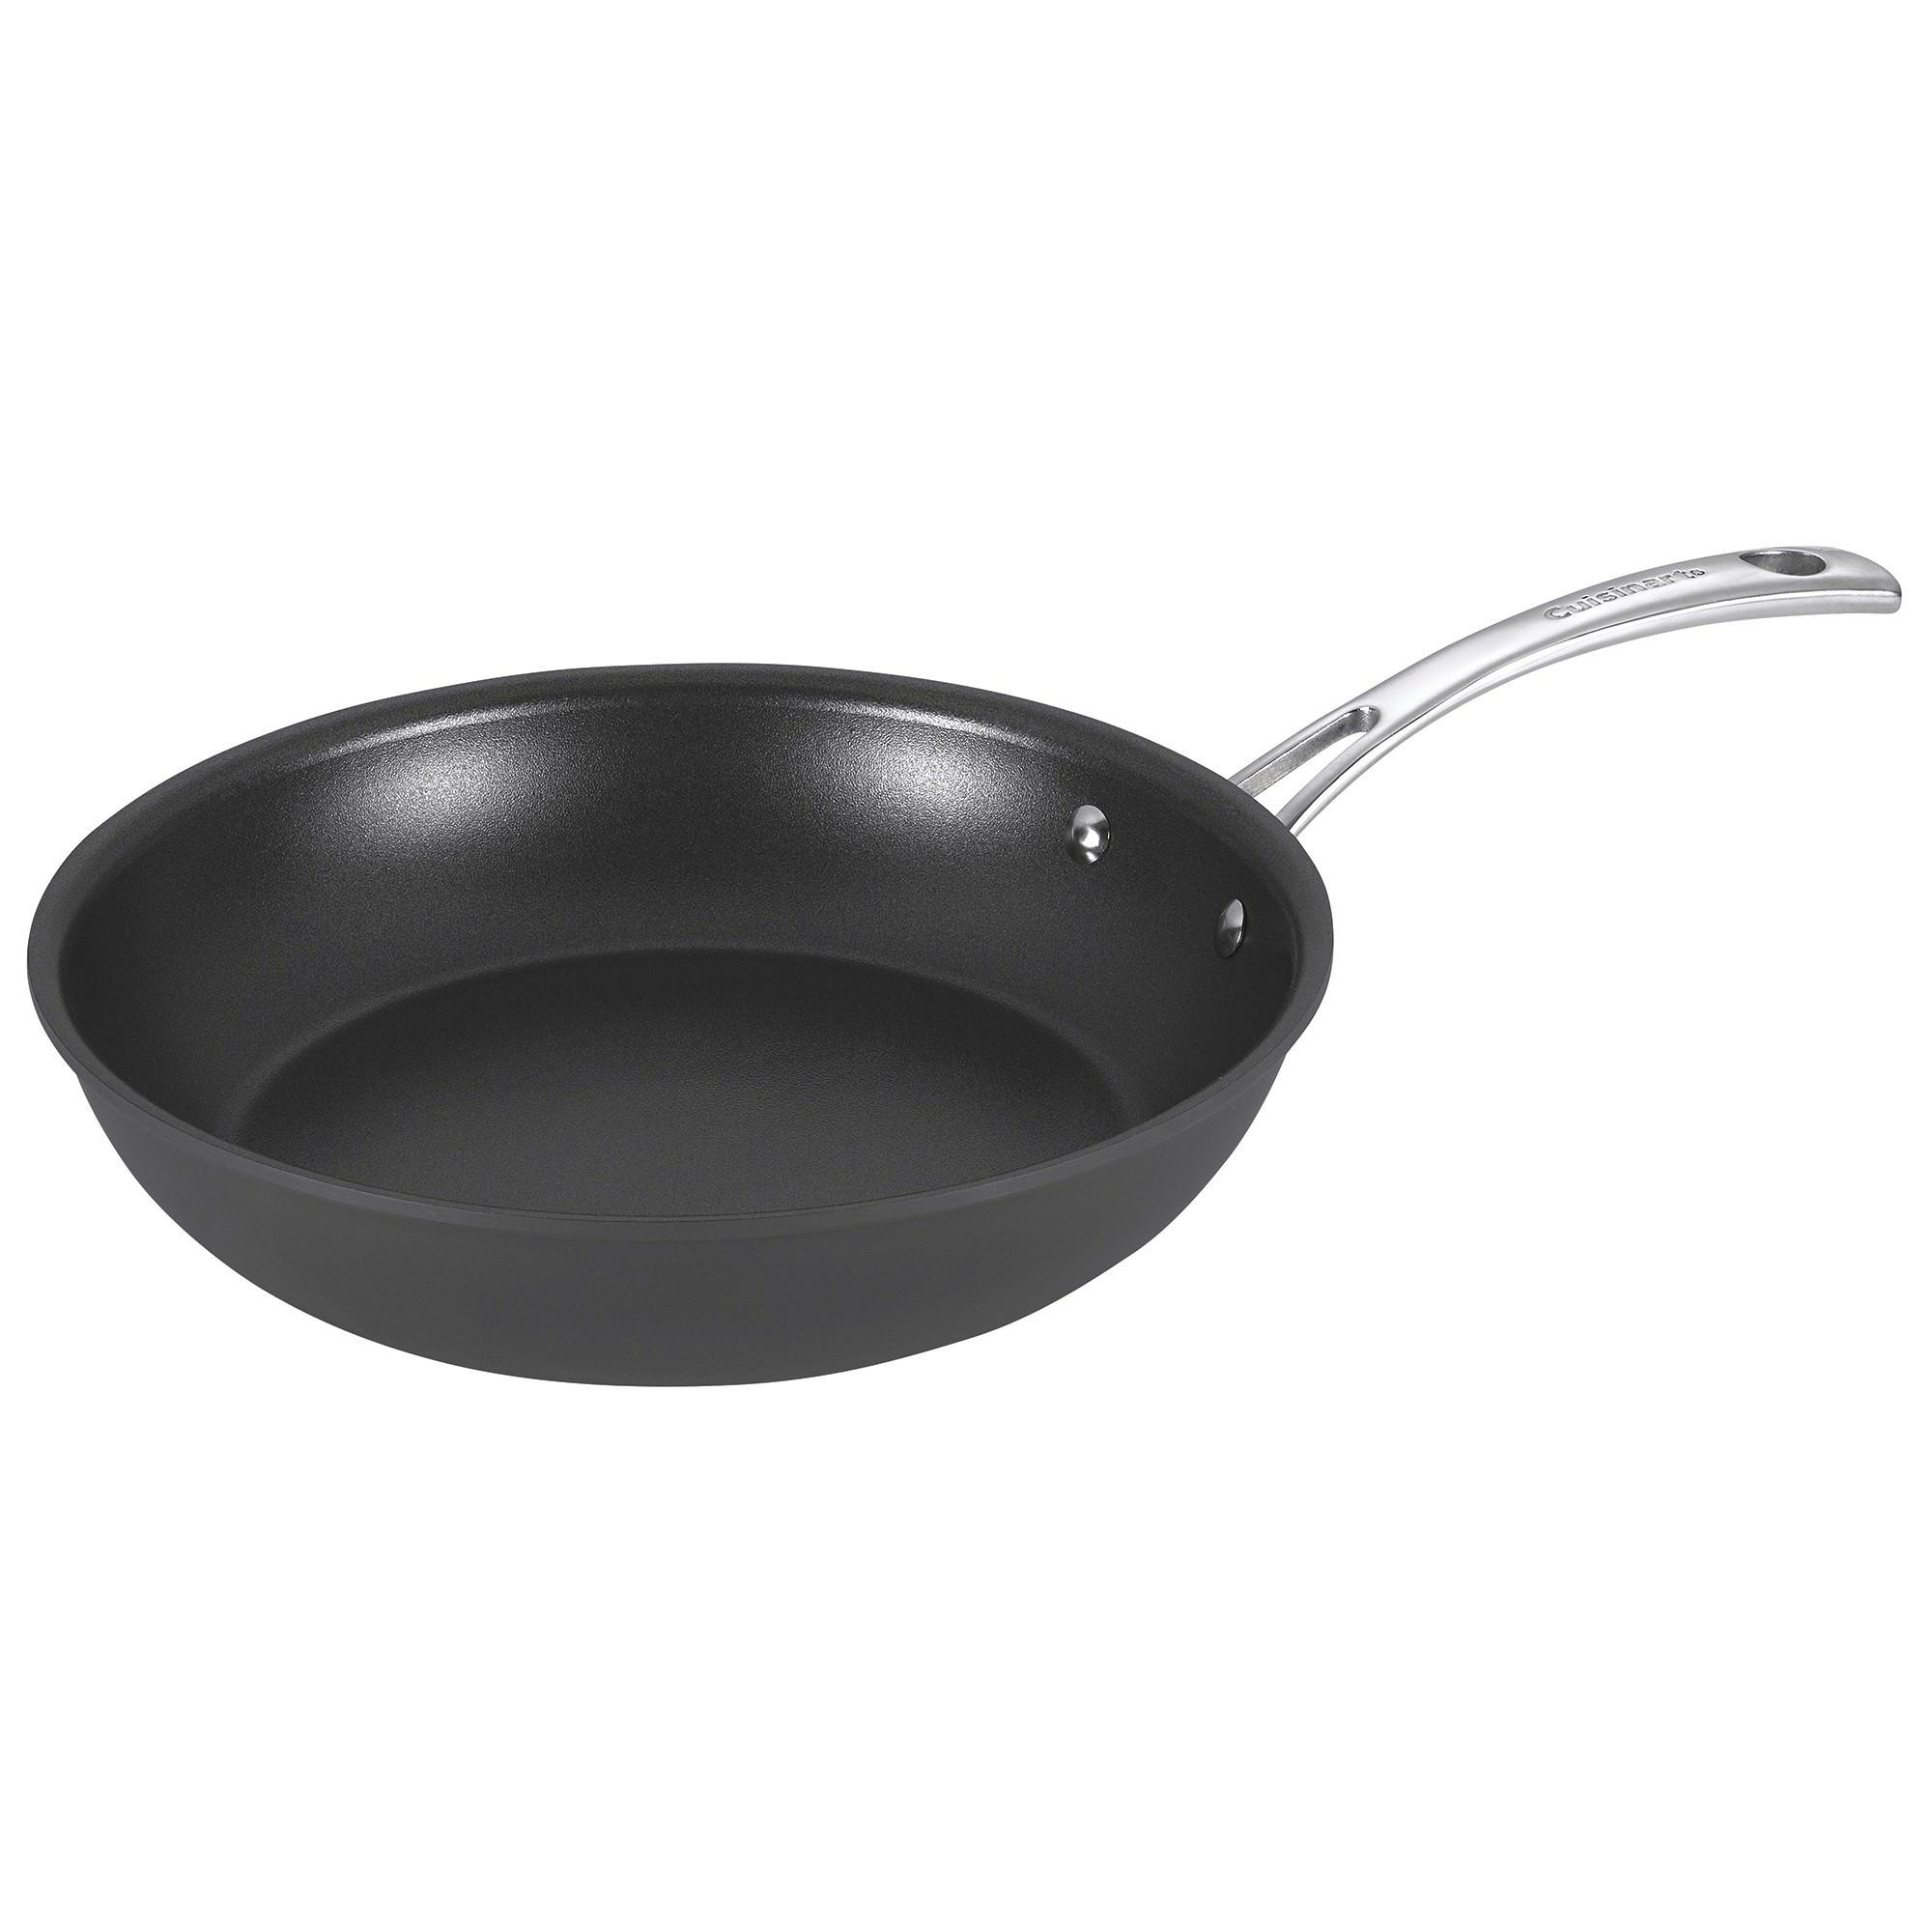 Cuisinart Chef iA+ Non-stick 26cm Fry Pan